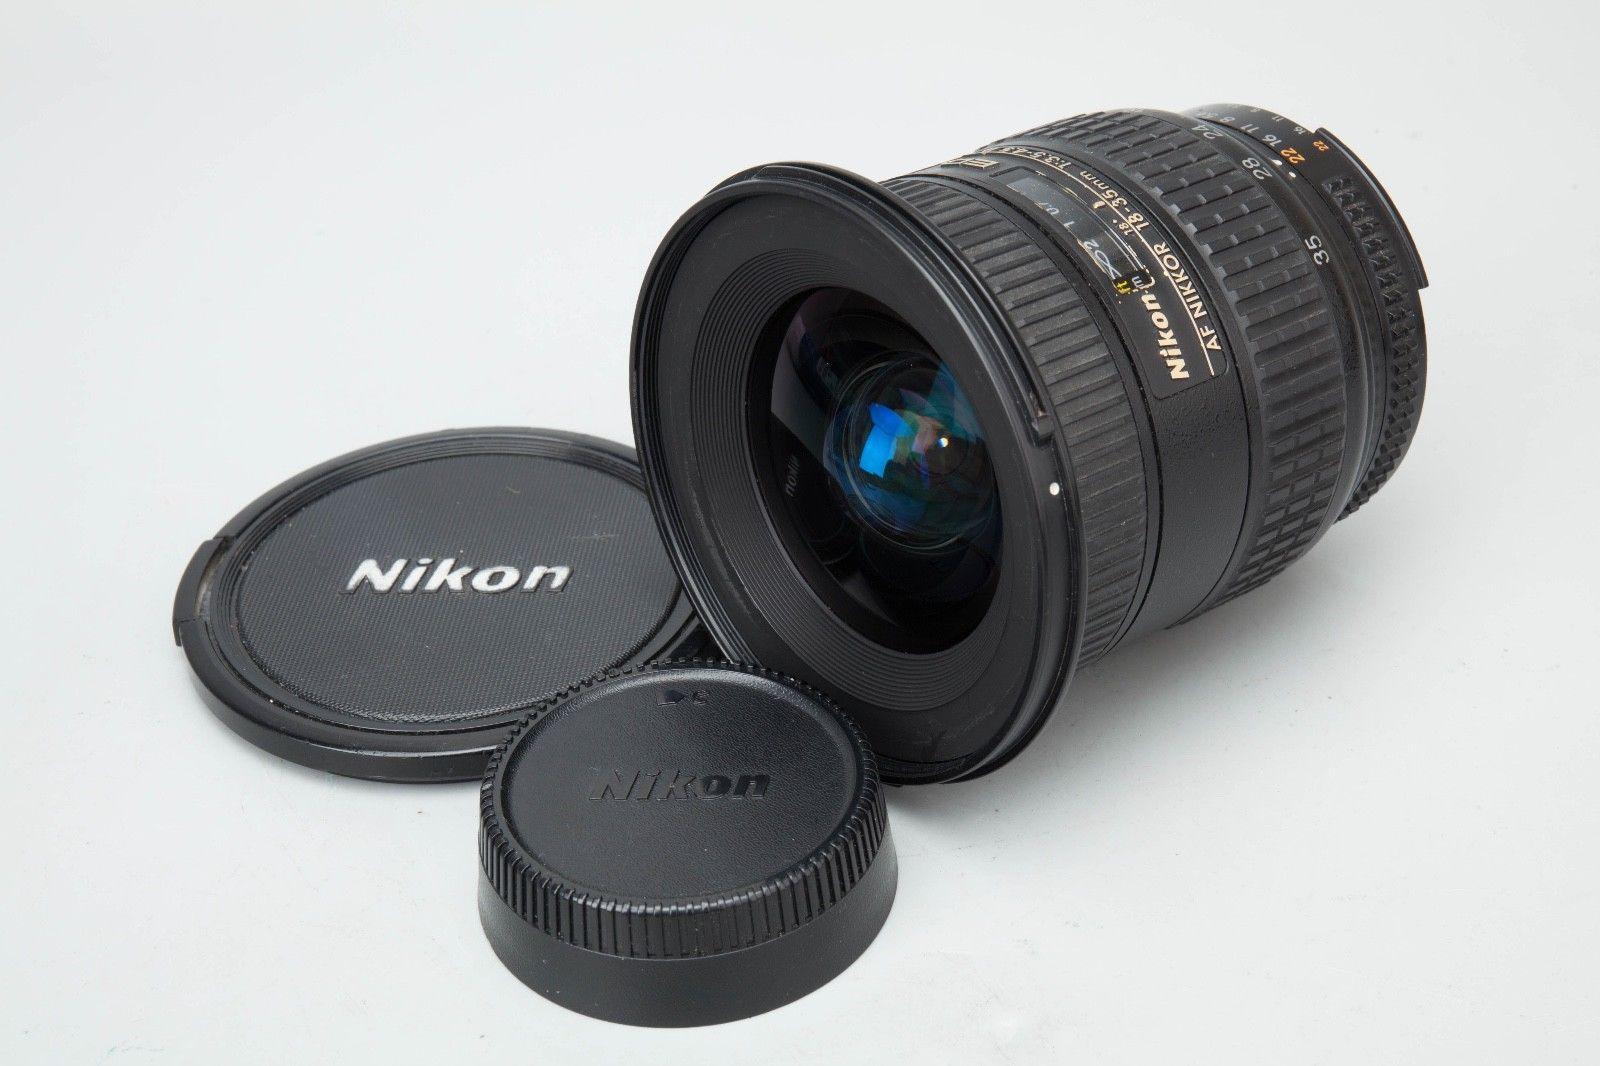 Nikon Af Nikkor 18 35mm F 3 5 4 5 D If Ed Lens For D7200 D750 D800 D810 F Mount Stuff To Buy Electronic Products Nikon